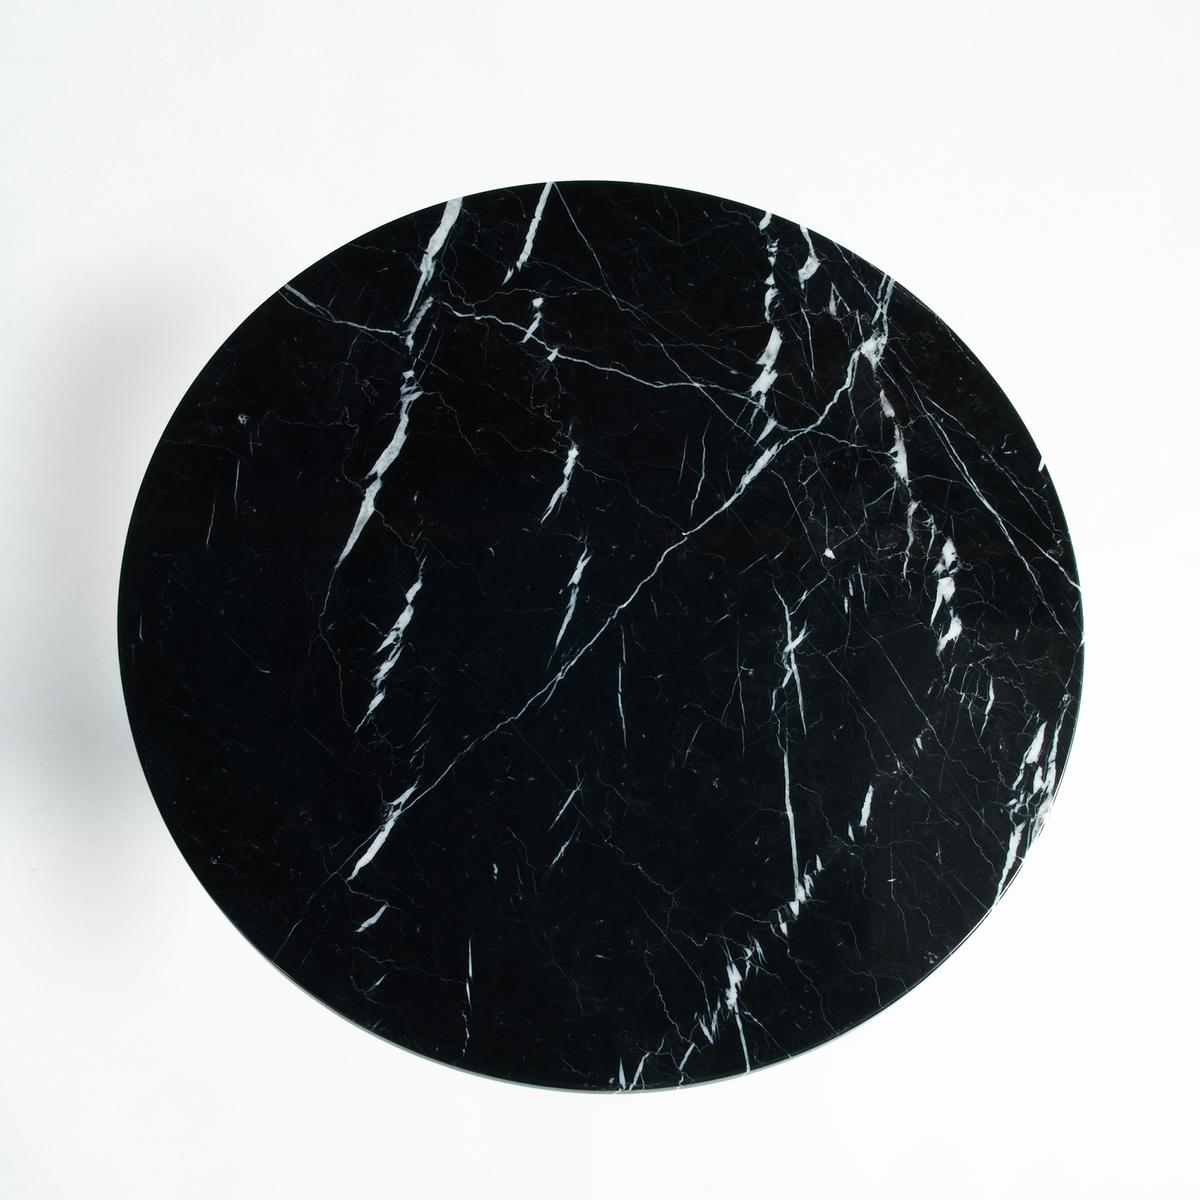 Столешница для стола из мрамора, Ø75 см, Aradan